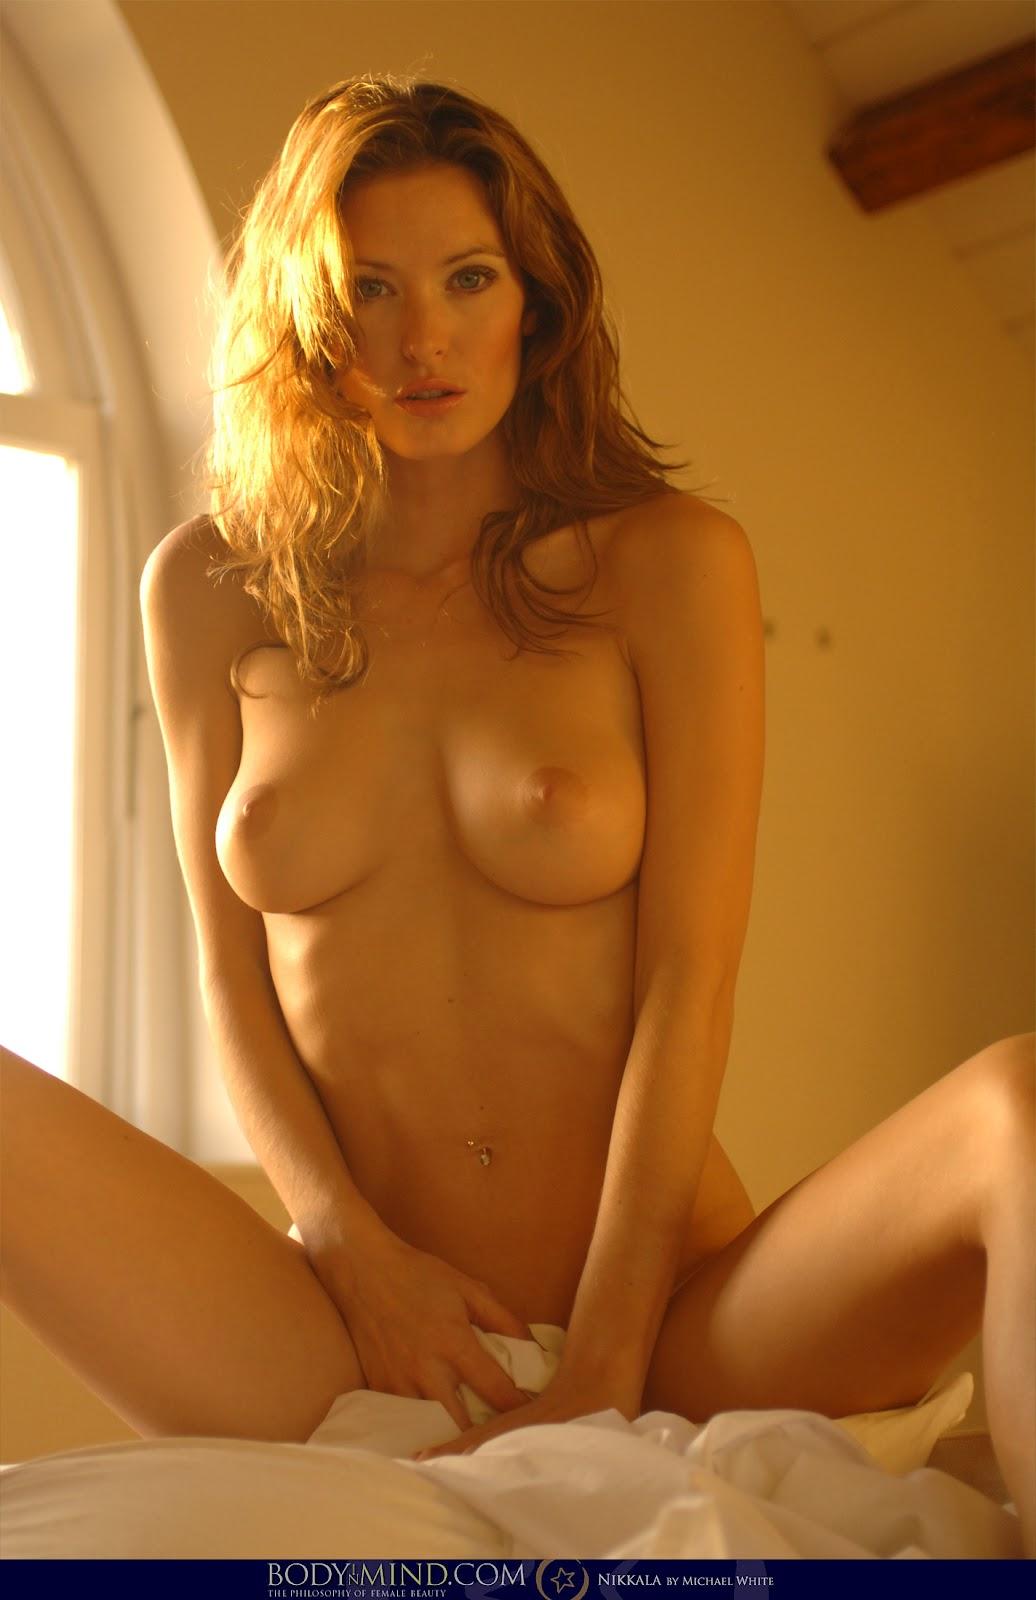 Alyssa milano black bra amp topless - 2 part 8